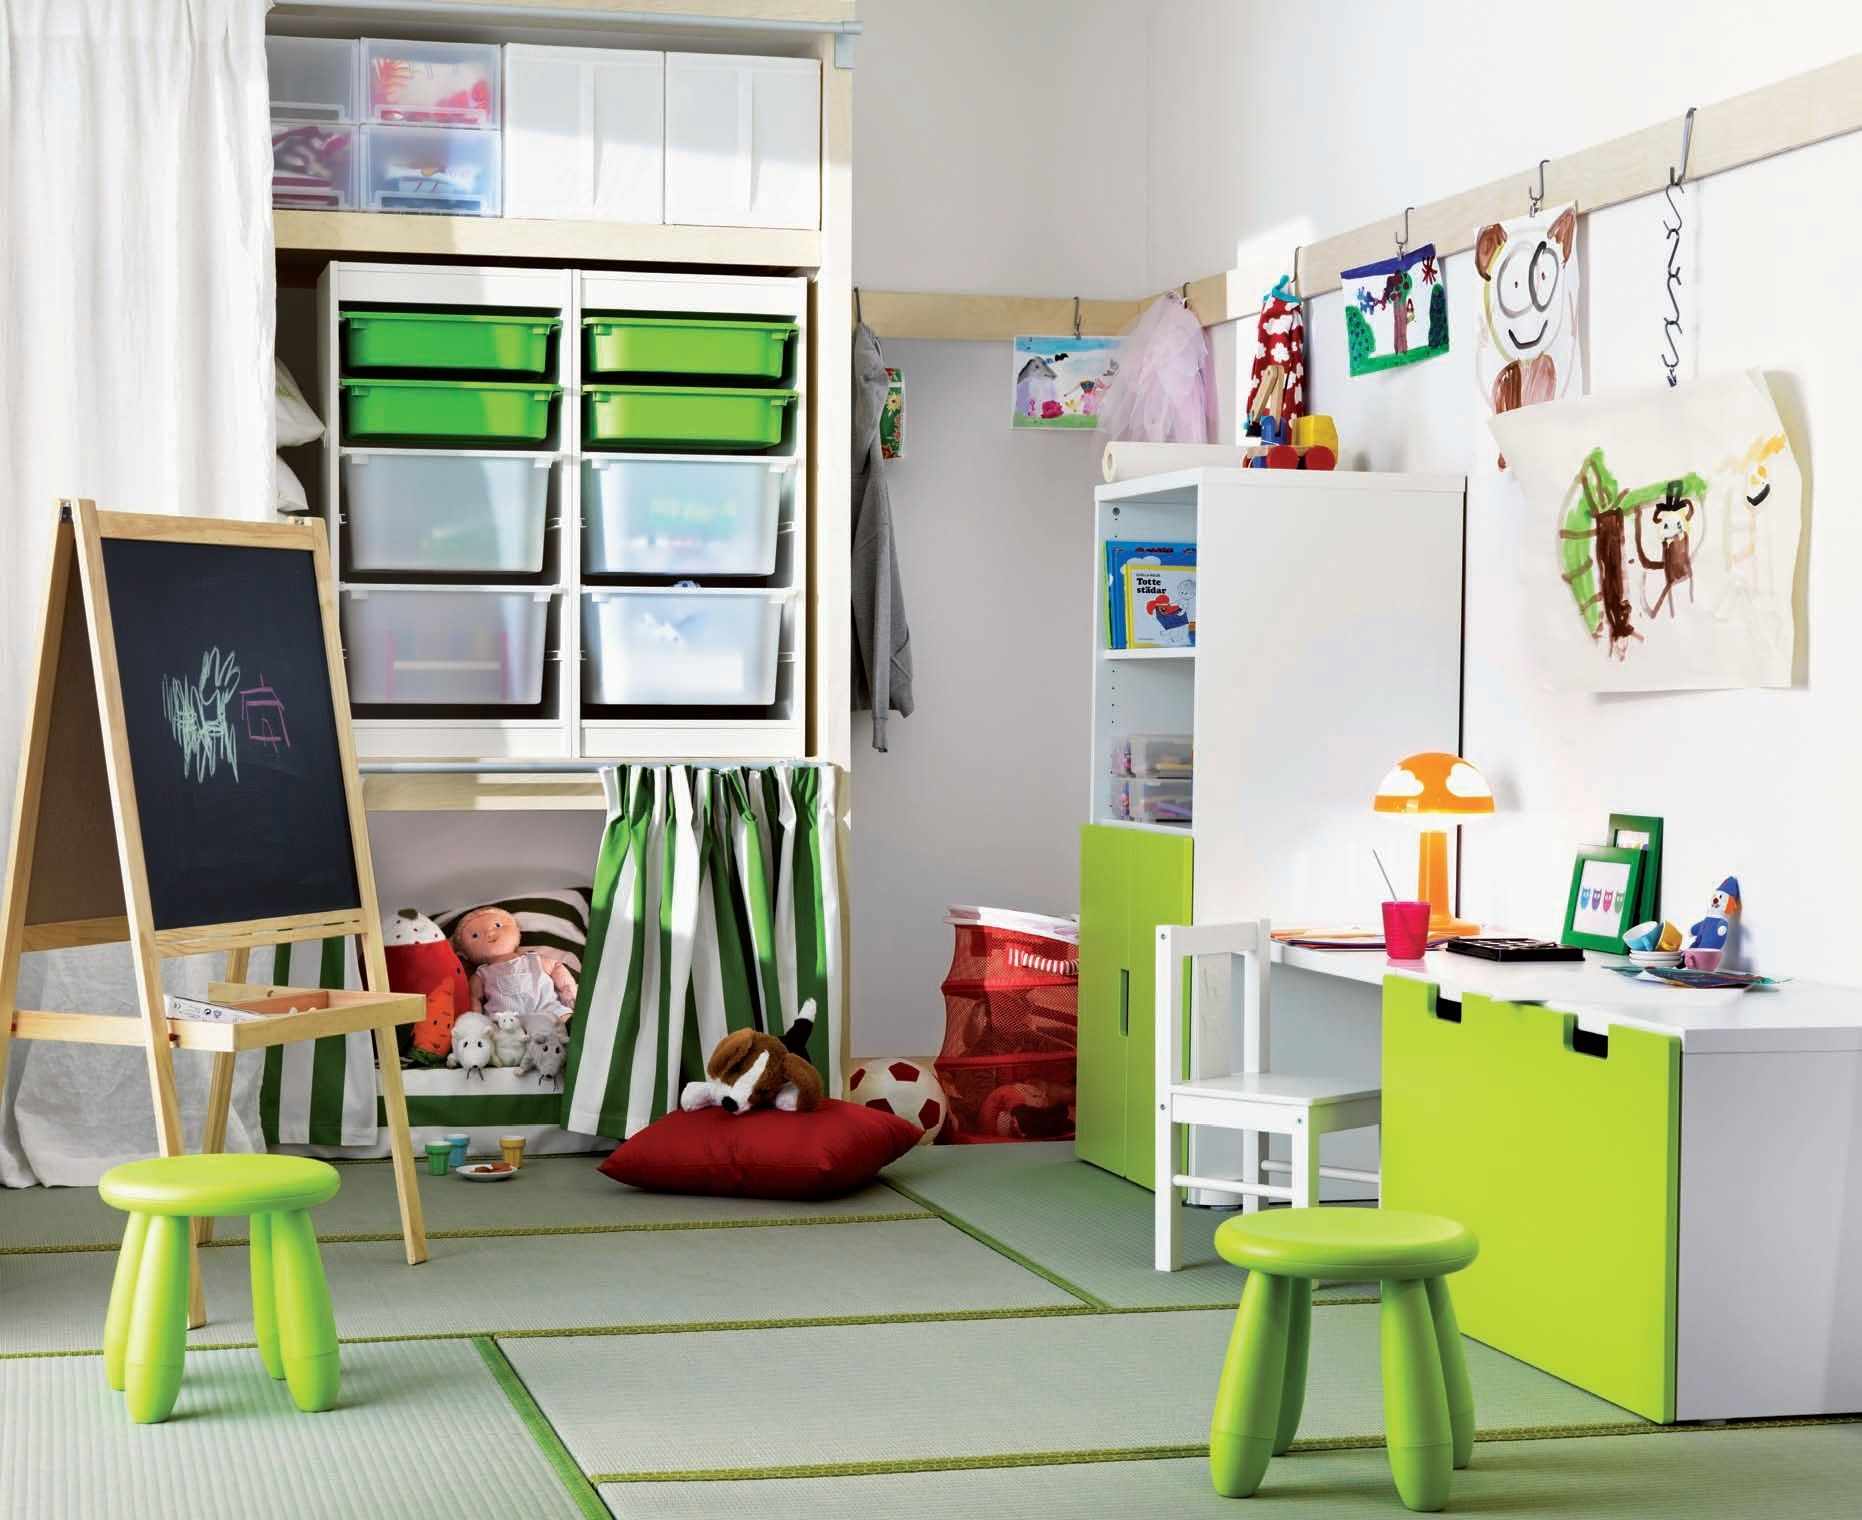 Ikea amueblar piso completo with ikea amueblar piso - Precio amueblar piso completo ...